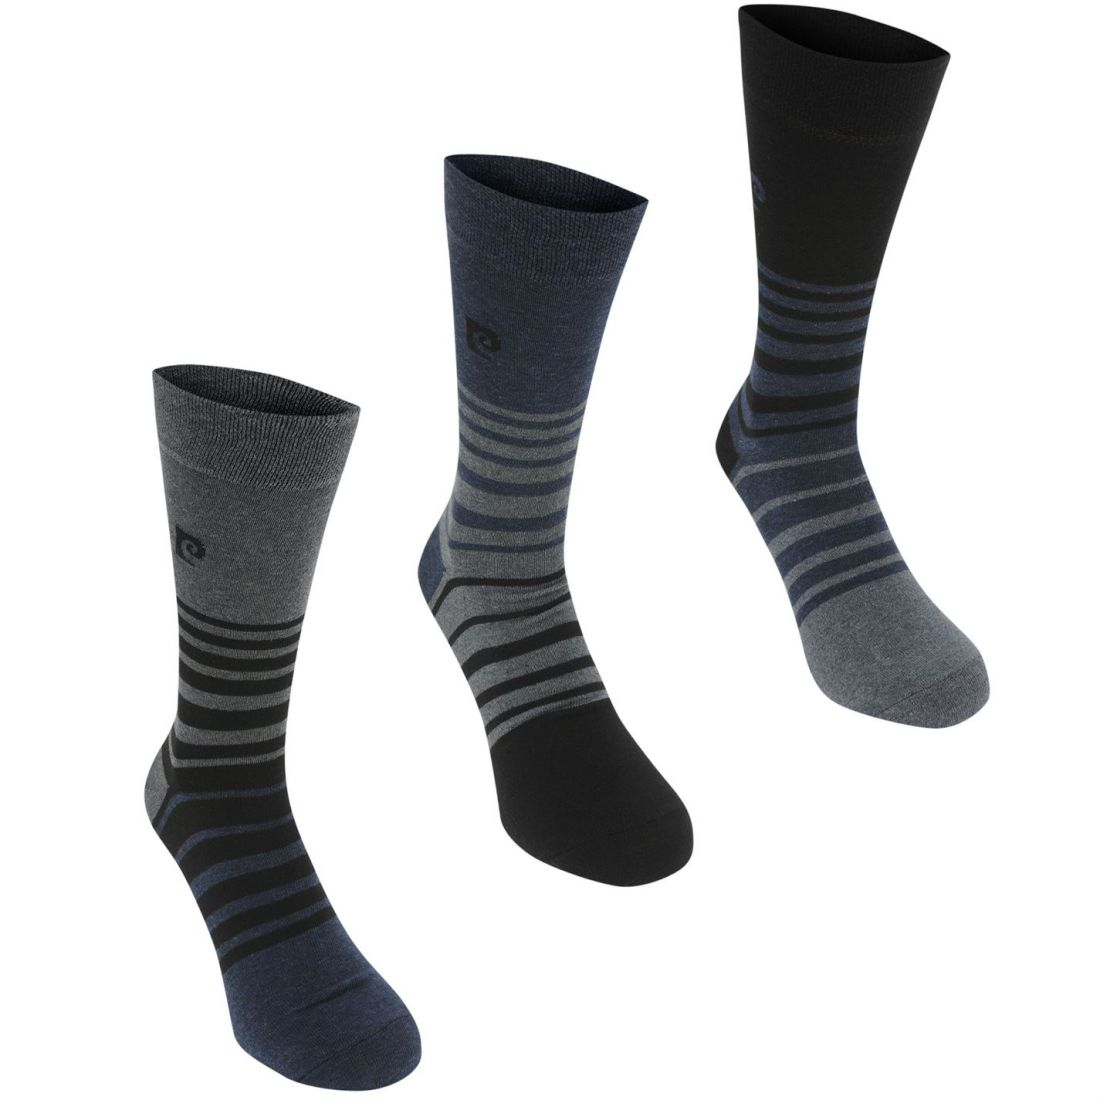 Pierre Cardin Mens 3 Pack Fashion Socks Crew Knitted | eBay